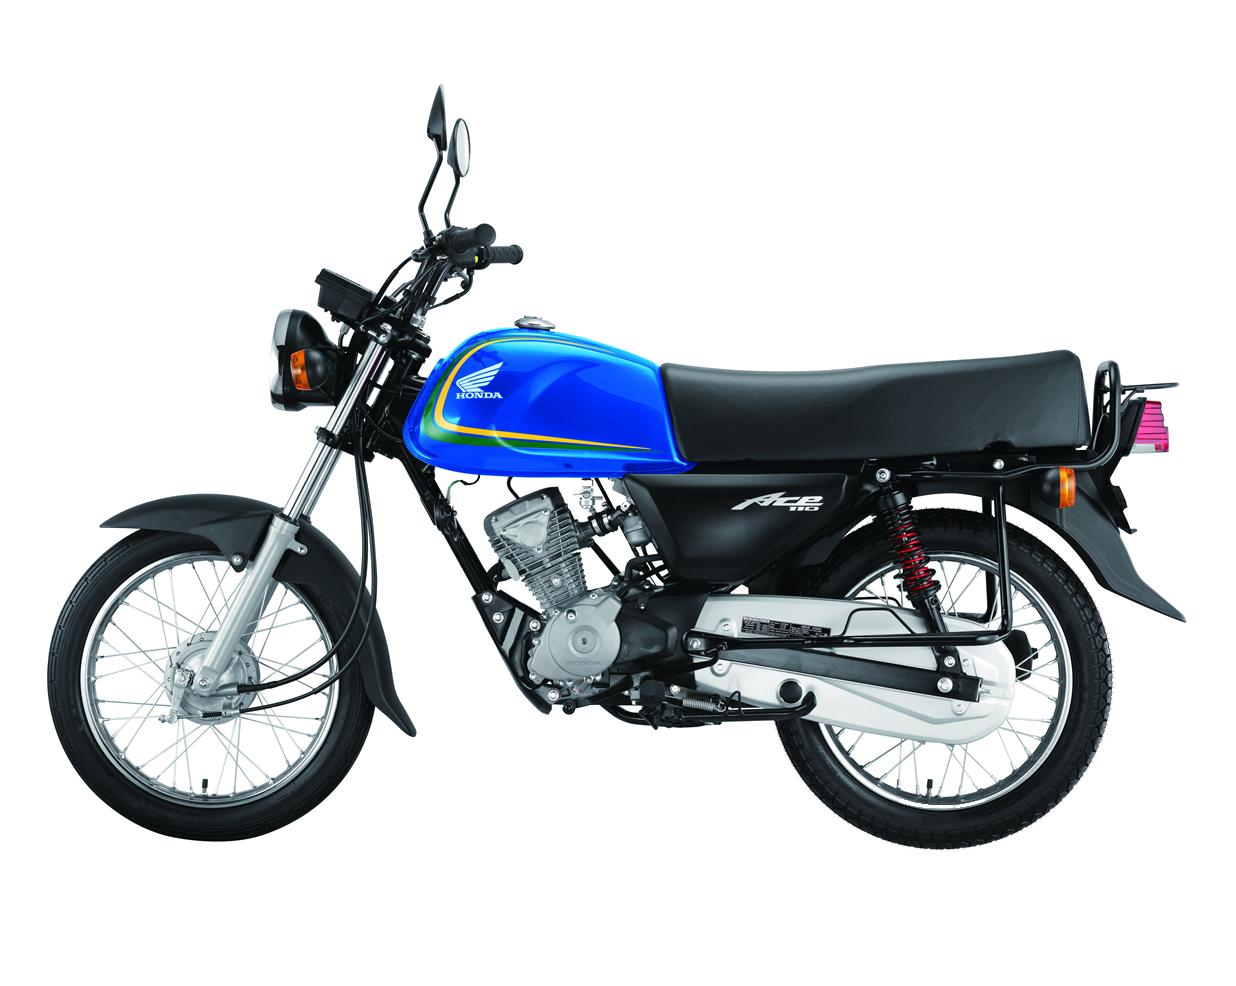 ACE 110 | Honda Motorcycles